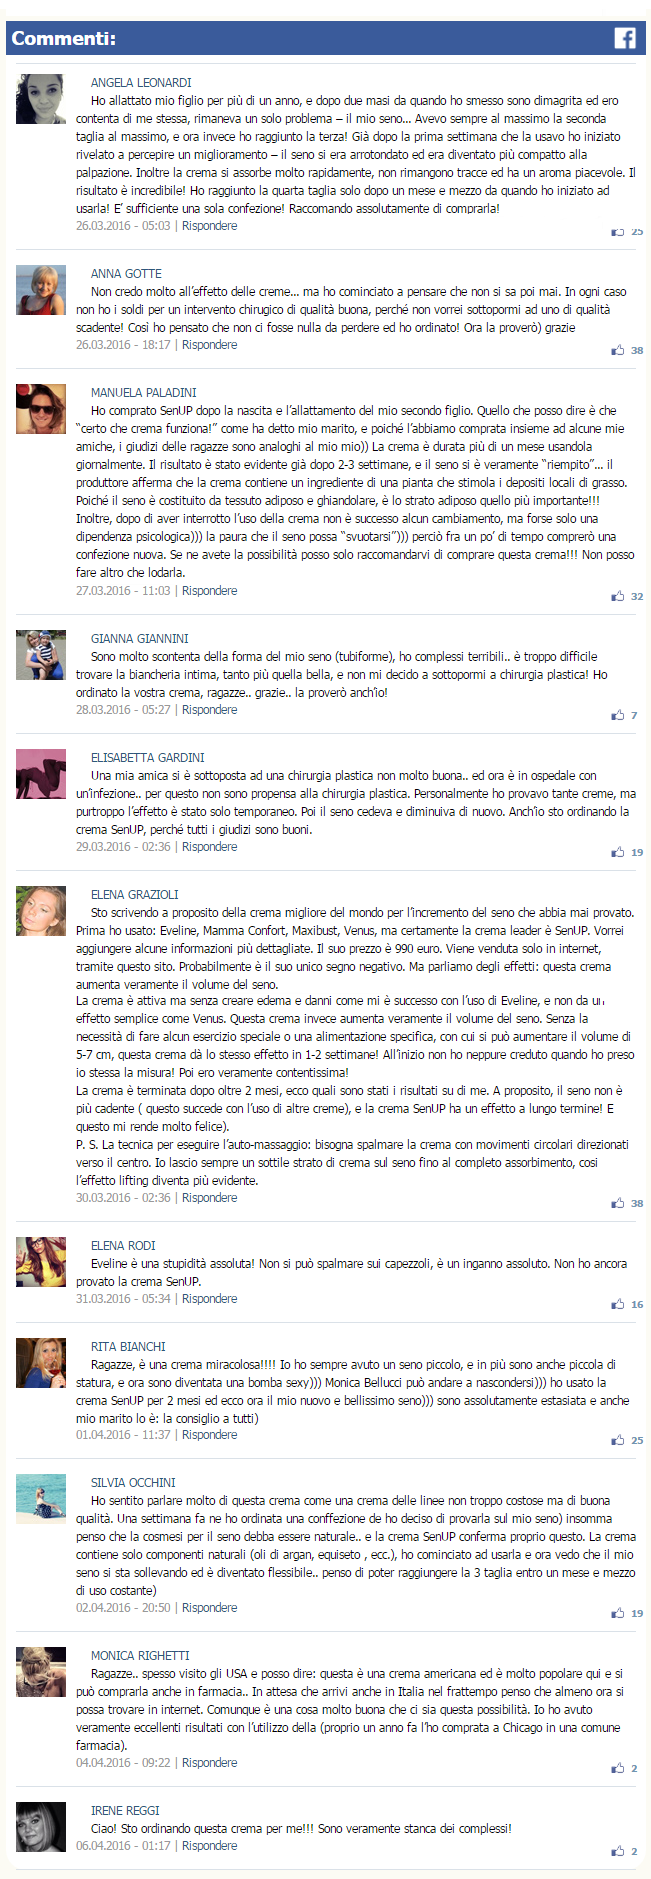 senup-commenti-facebook